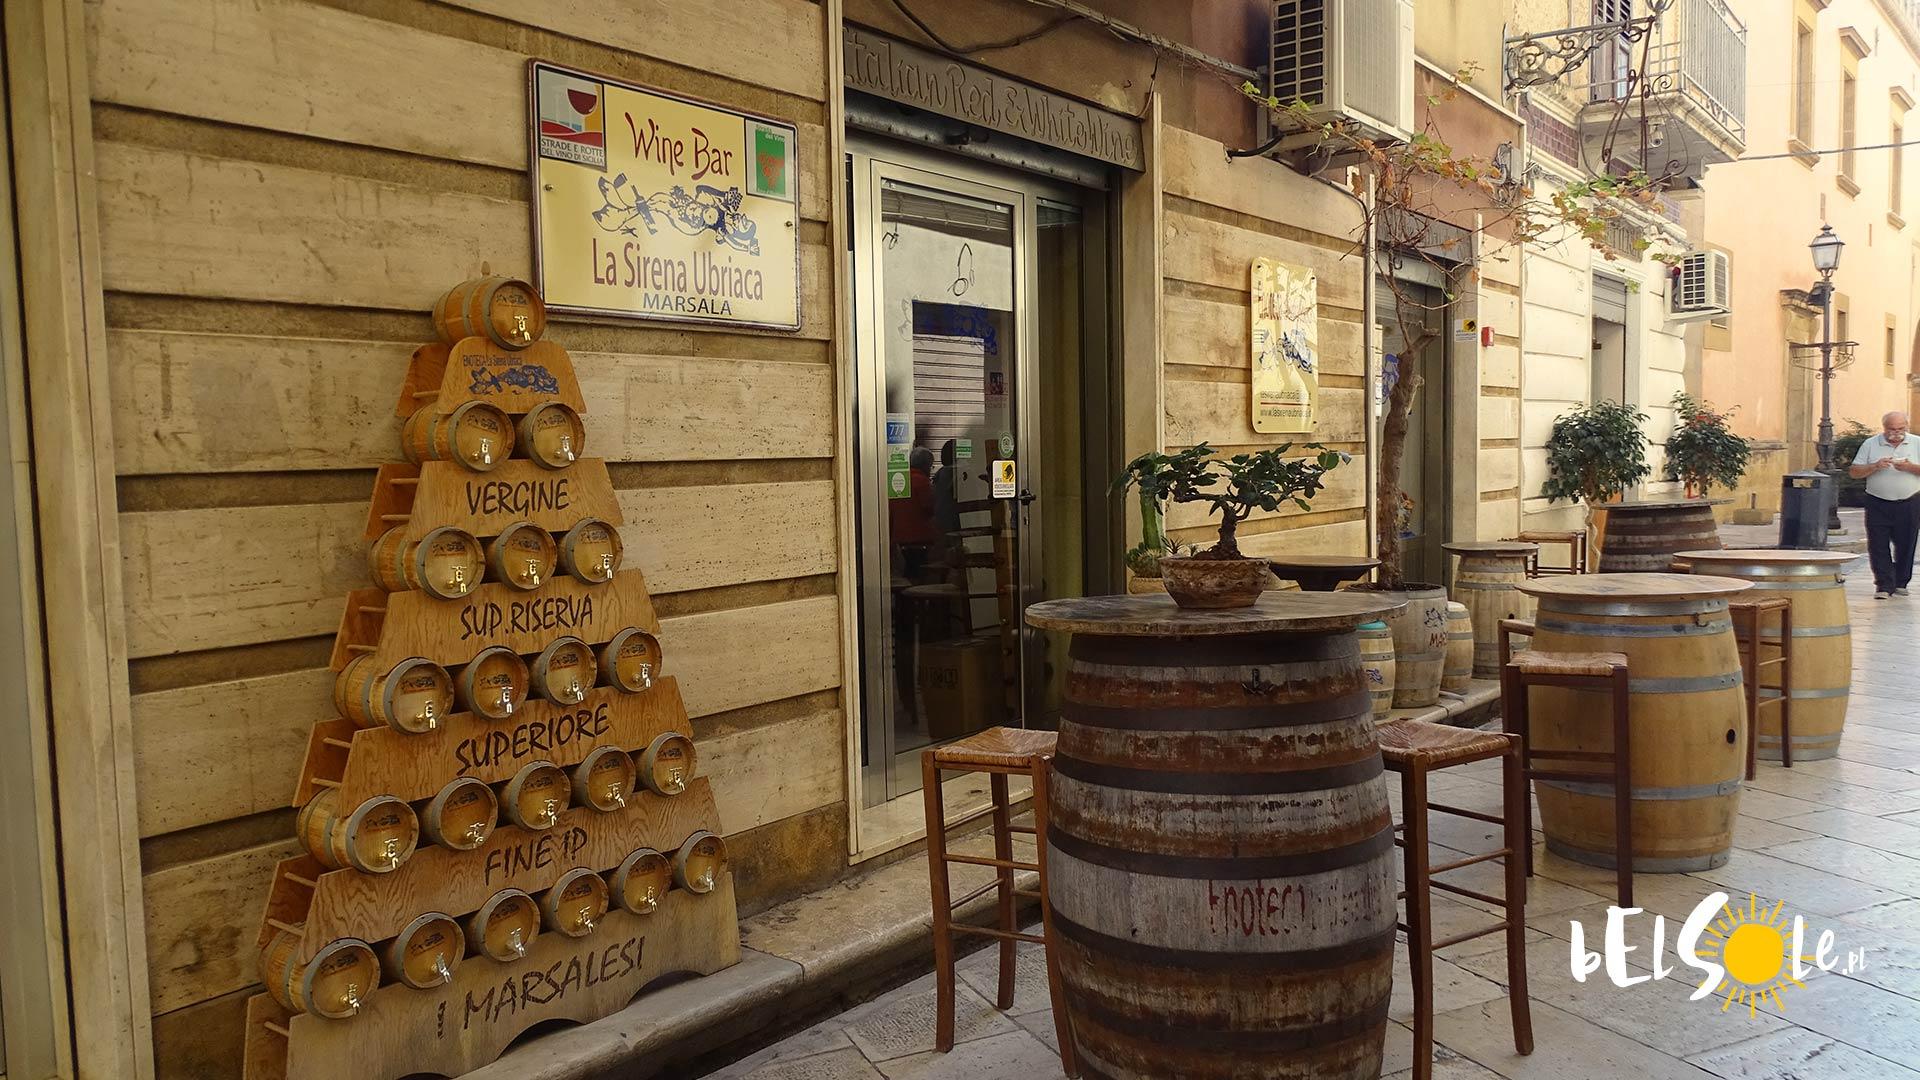 Winebar Marsala